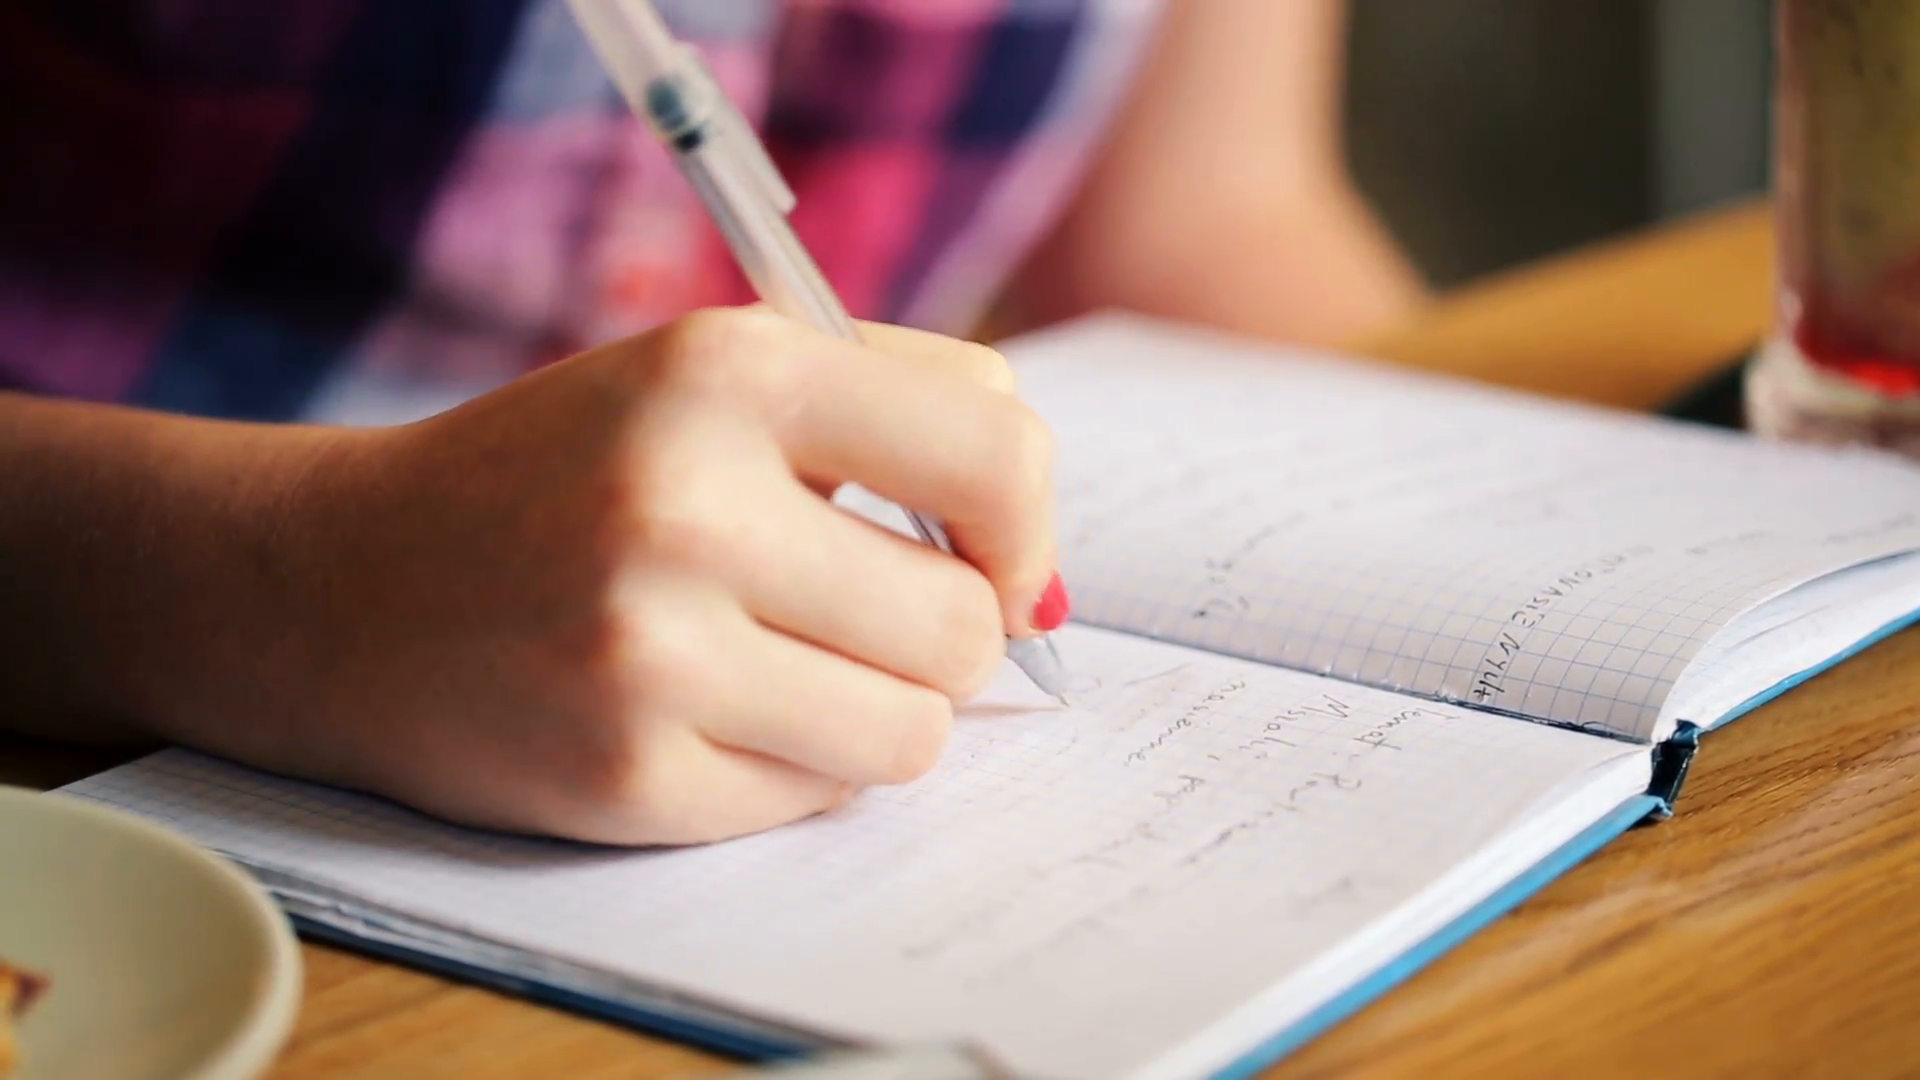 teenage-girl-hands-writing-in-notebook-doing-homework_vyfyytly__F0000.